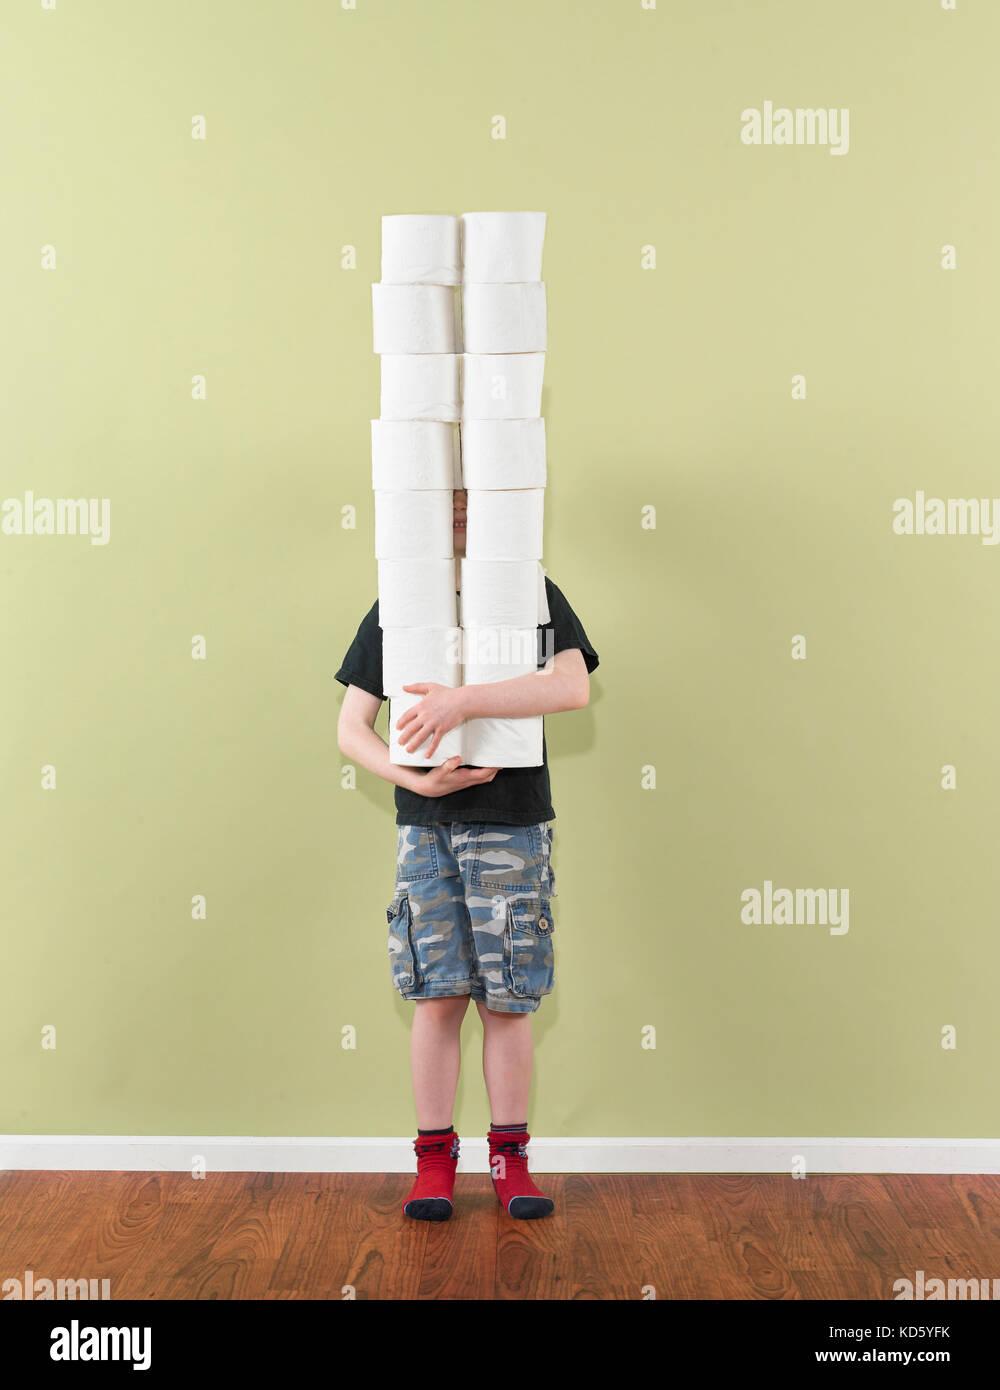 boy 4-7 balancing two stacks of toilet paper - Stock Image